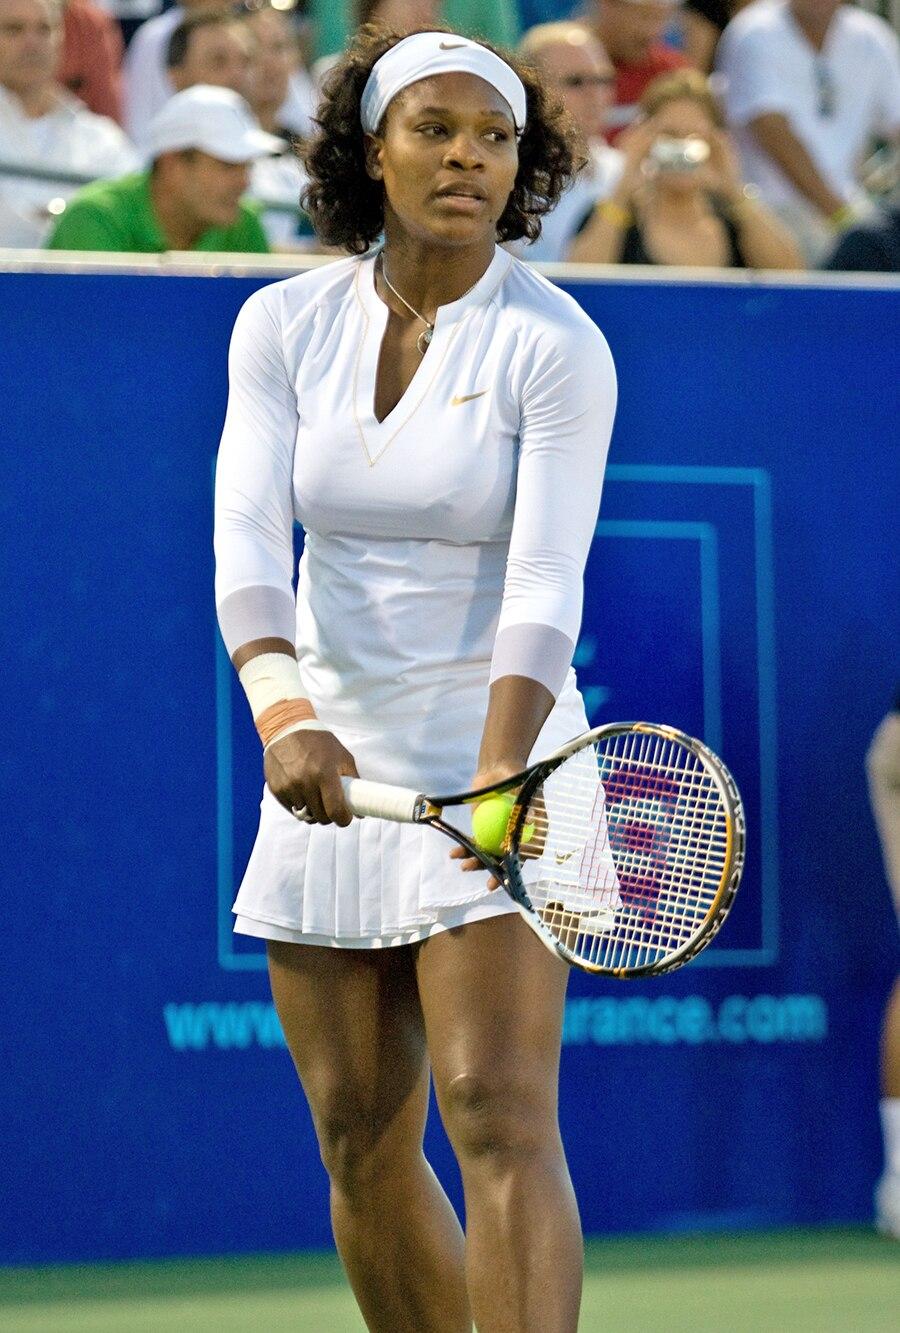 Serena Williams July 2008